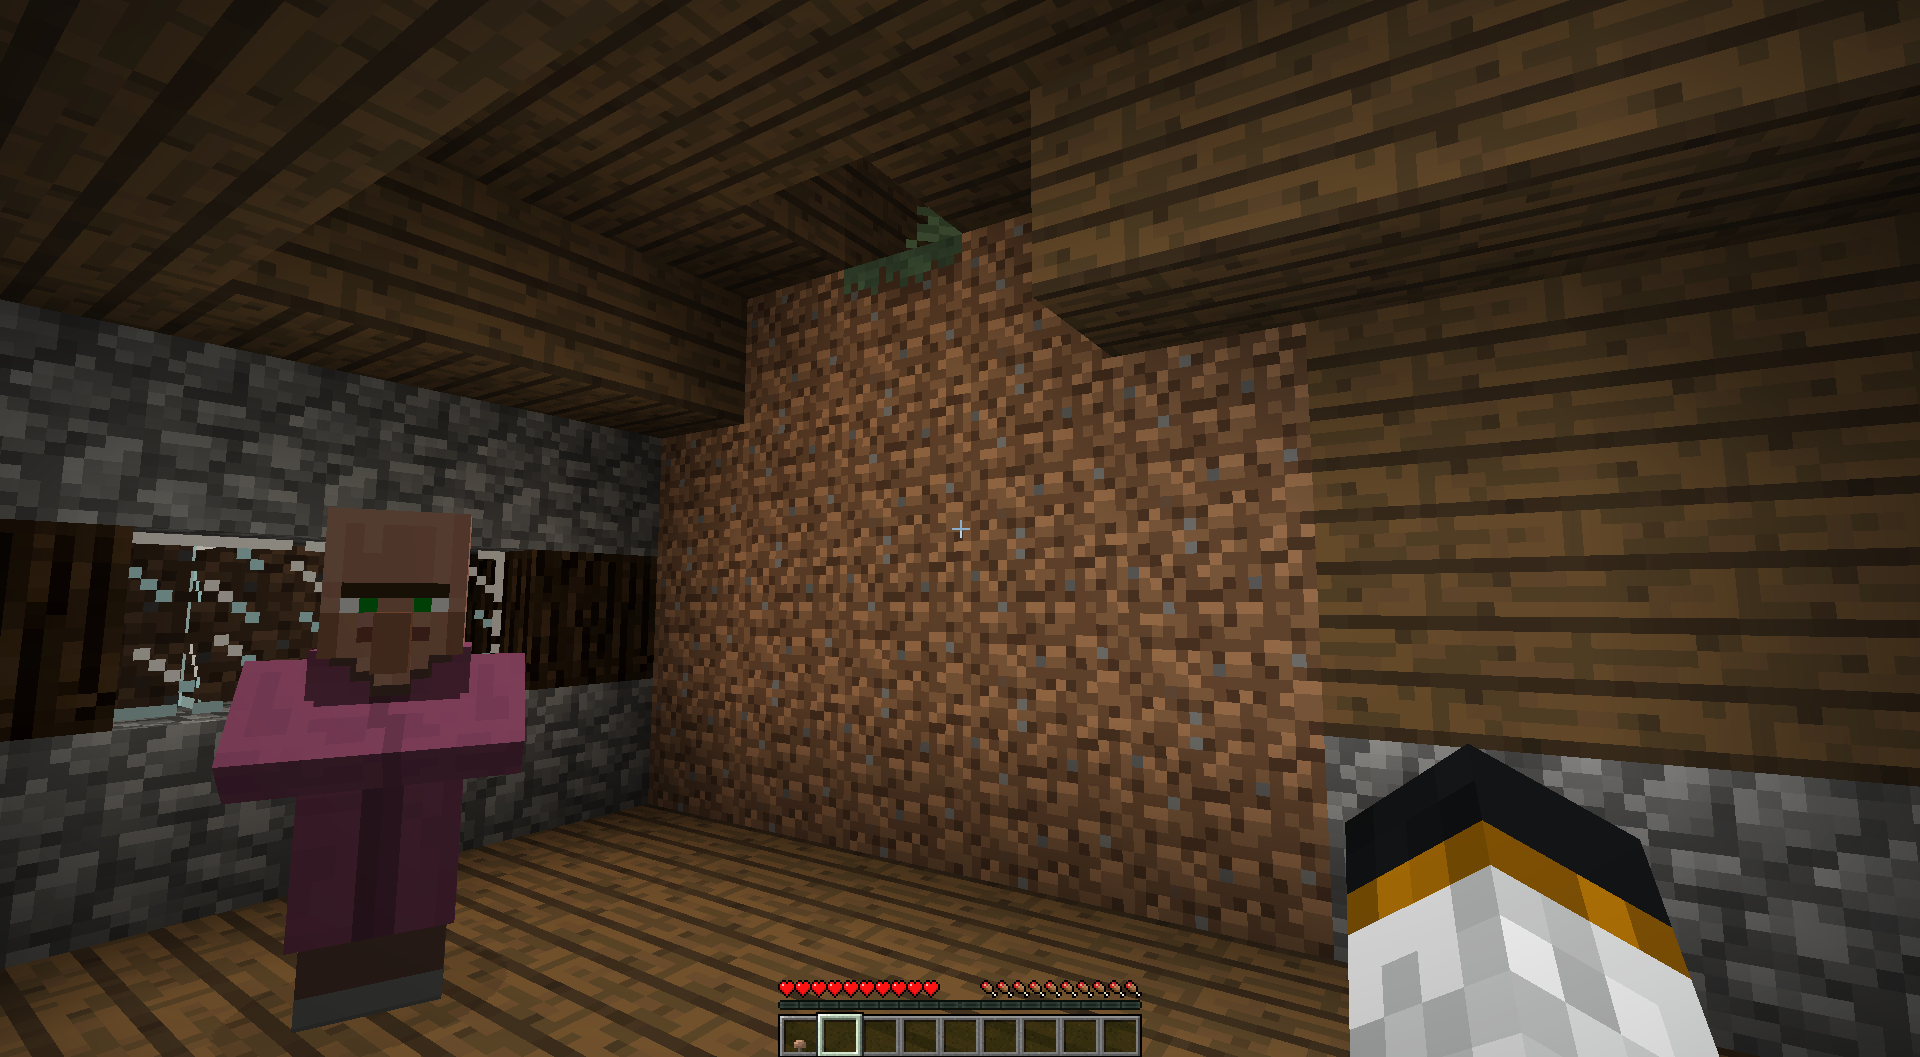 MC-109342] Big dirt walls in Large village house  - Jira